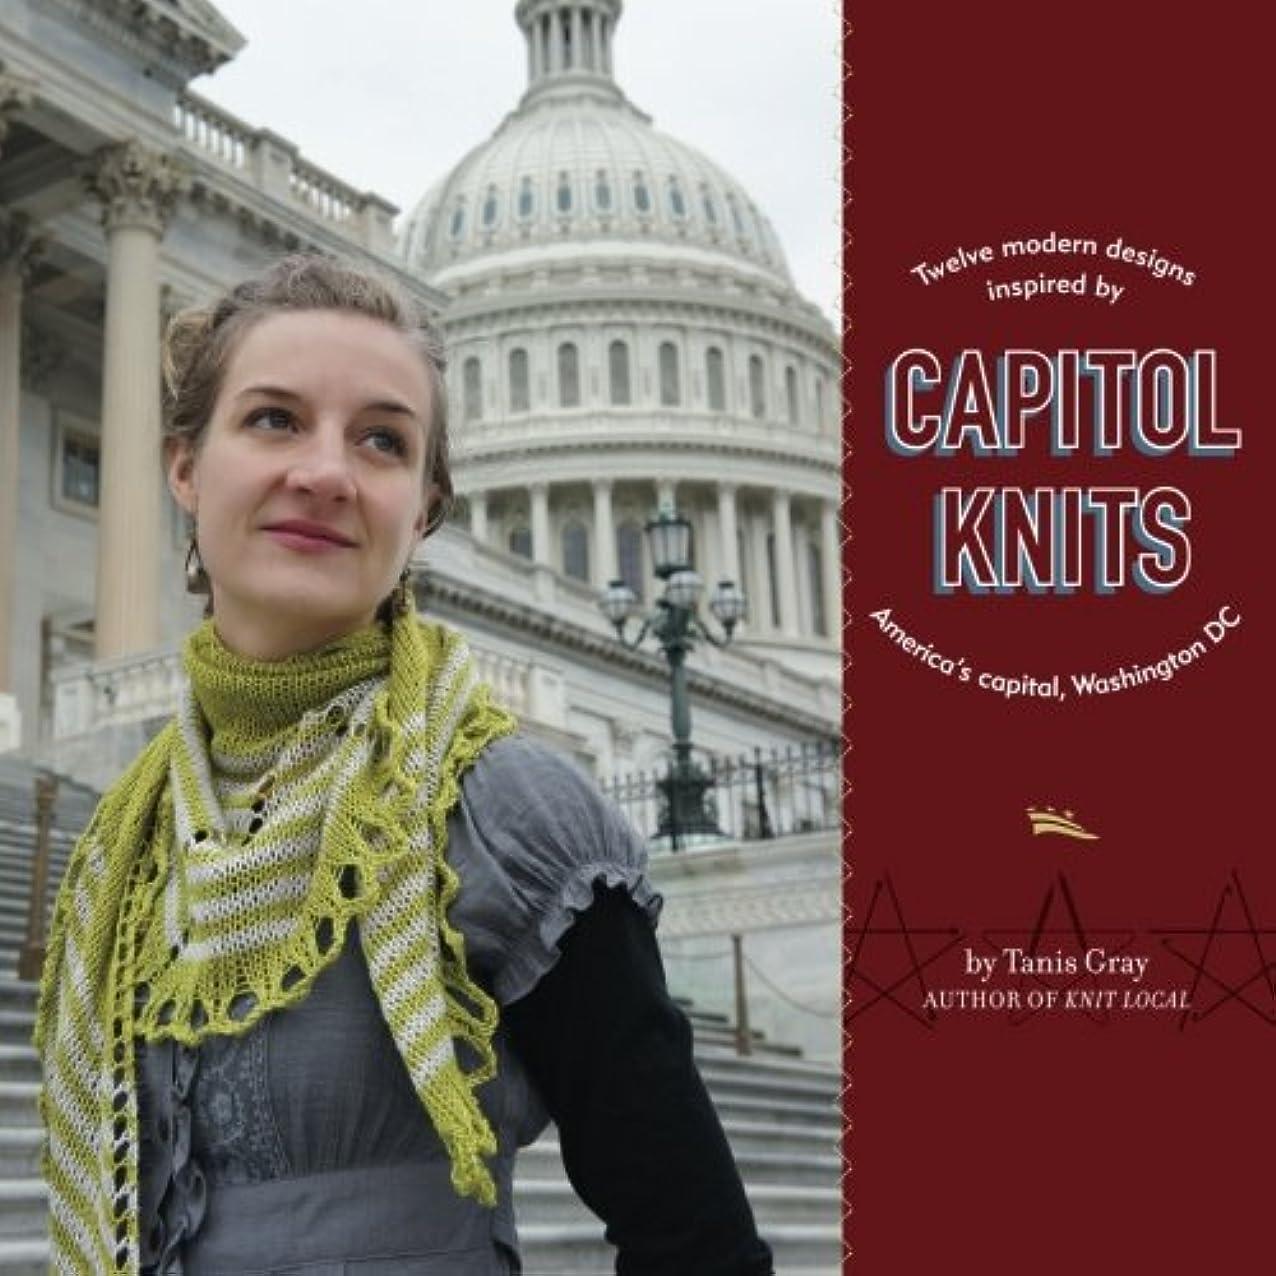 Capitol Knits: Twelve Modern Designs Inspired by America's Capital, Washington DC, Vol. 1 gfwupzizcmyxg745